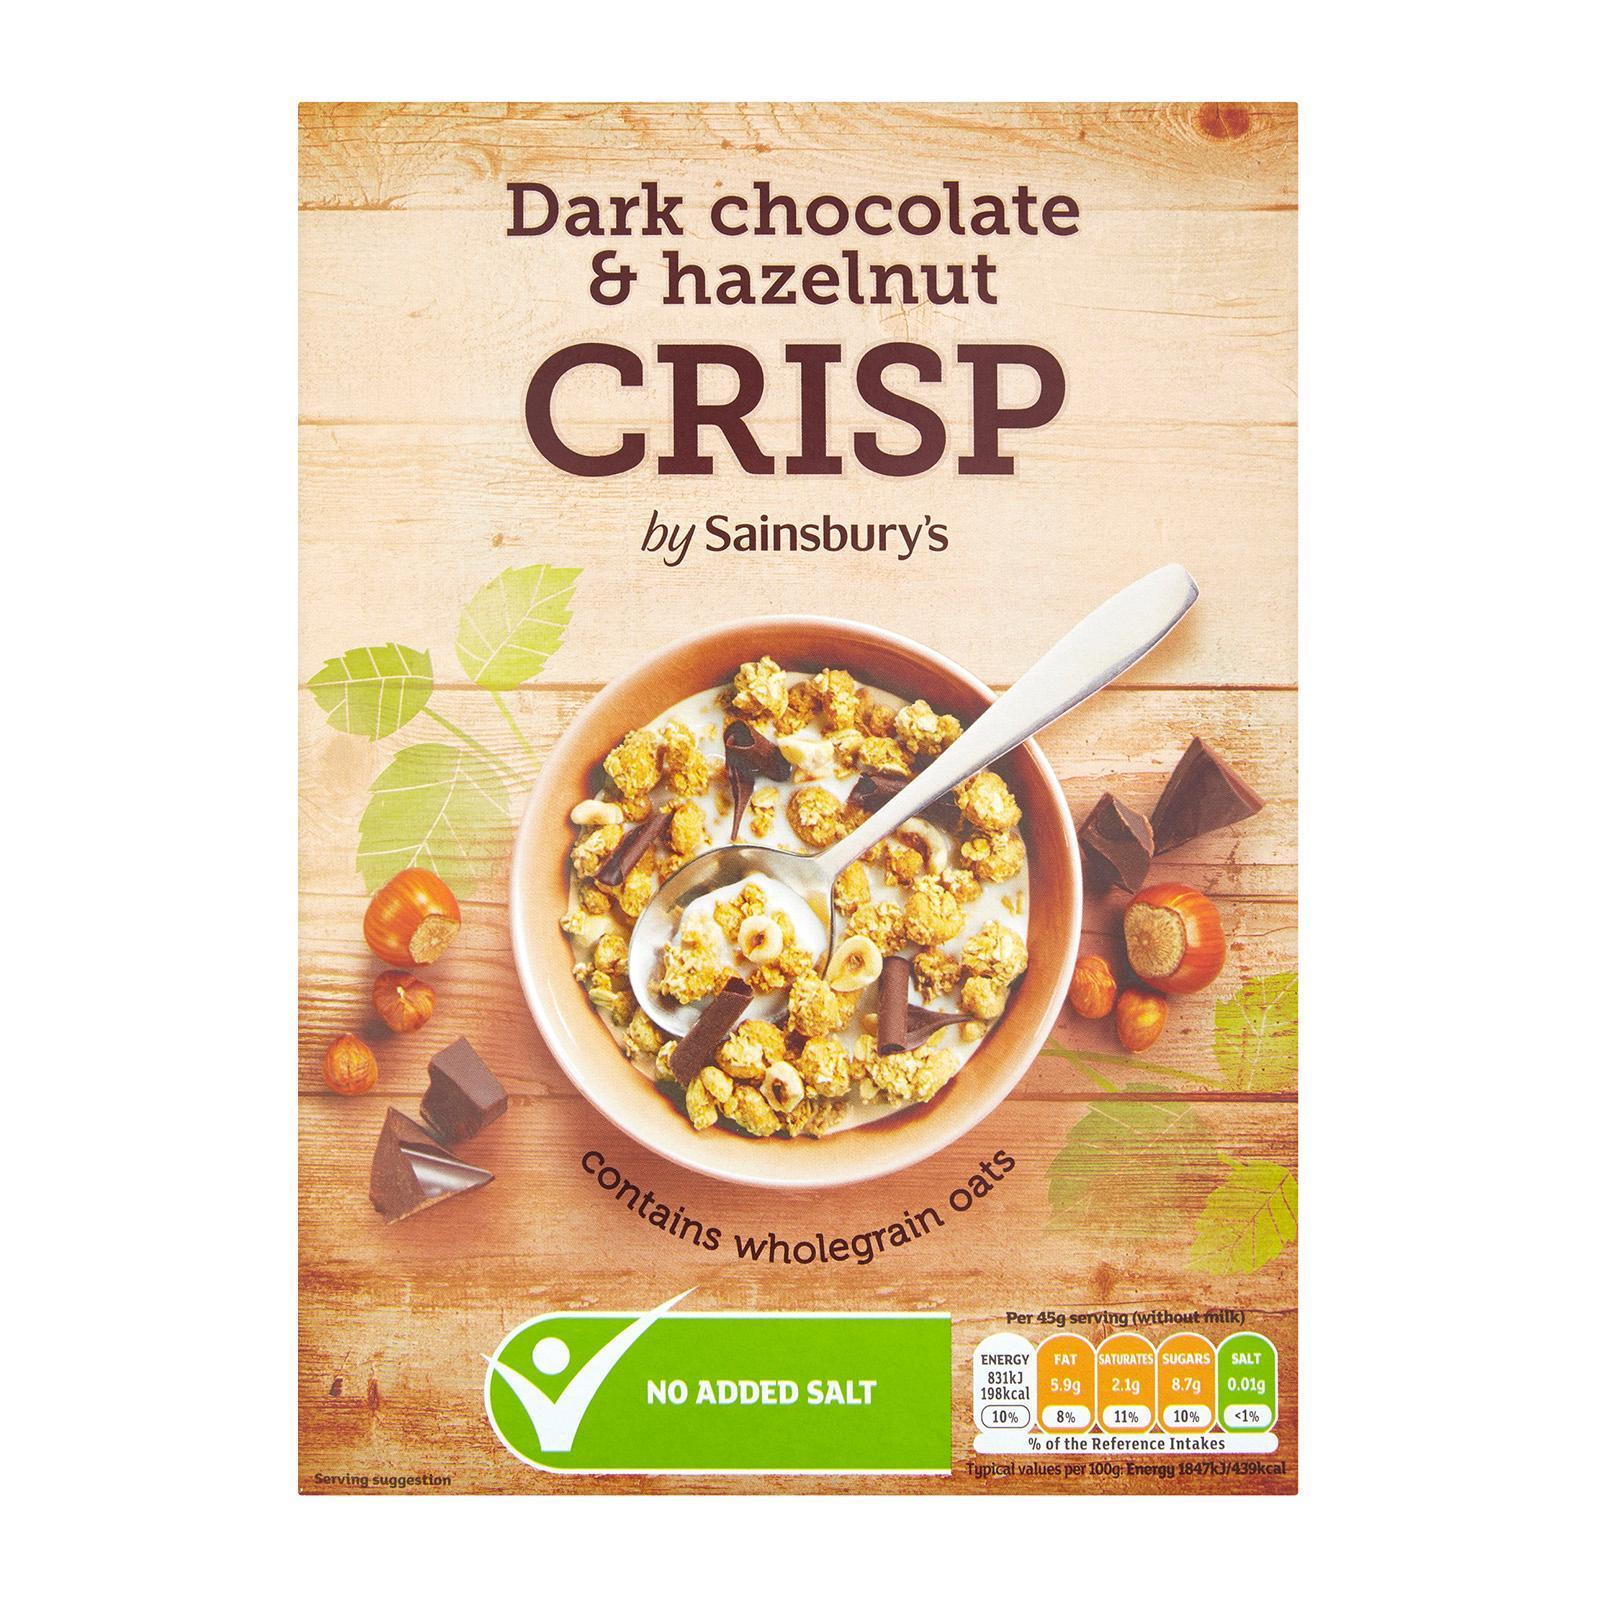 Sainsbury's Dark Chocolate And Hazelnut Granola